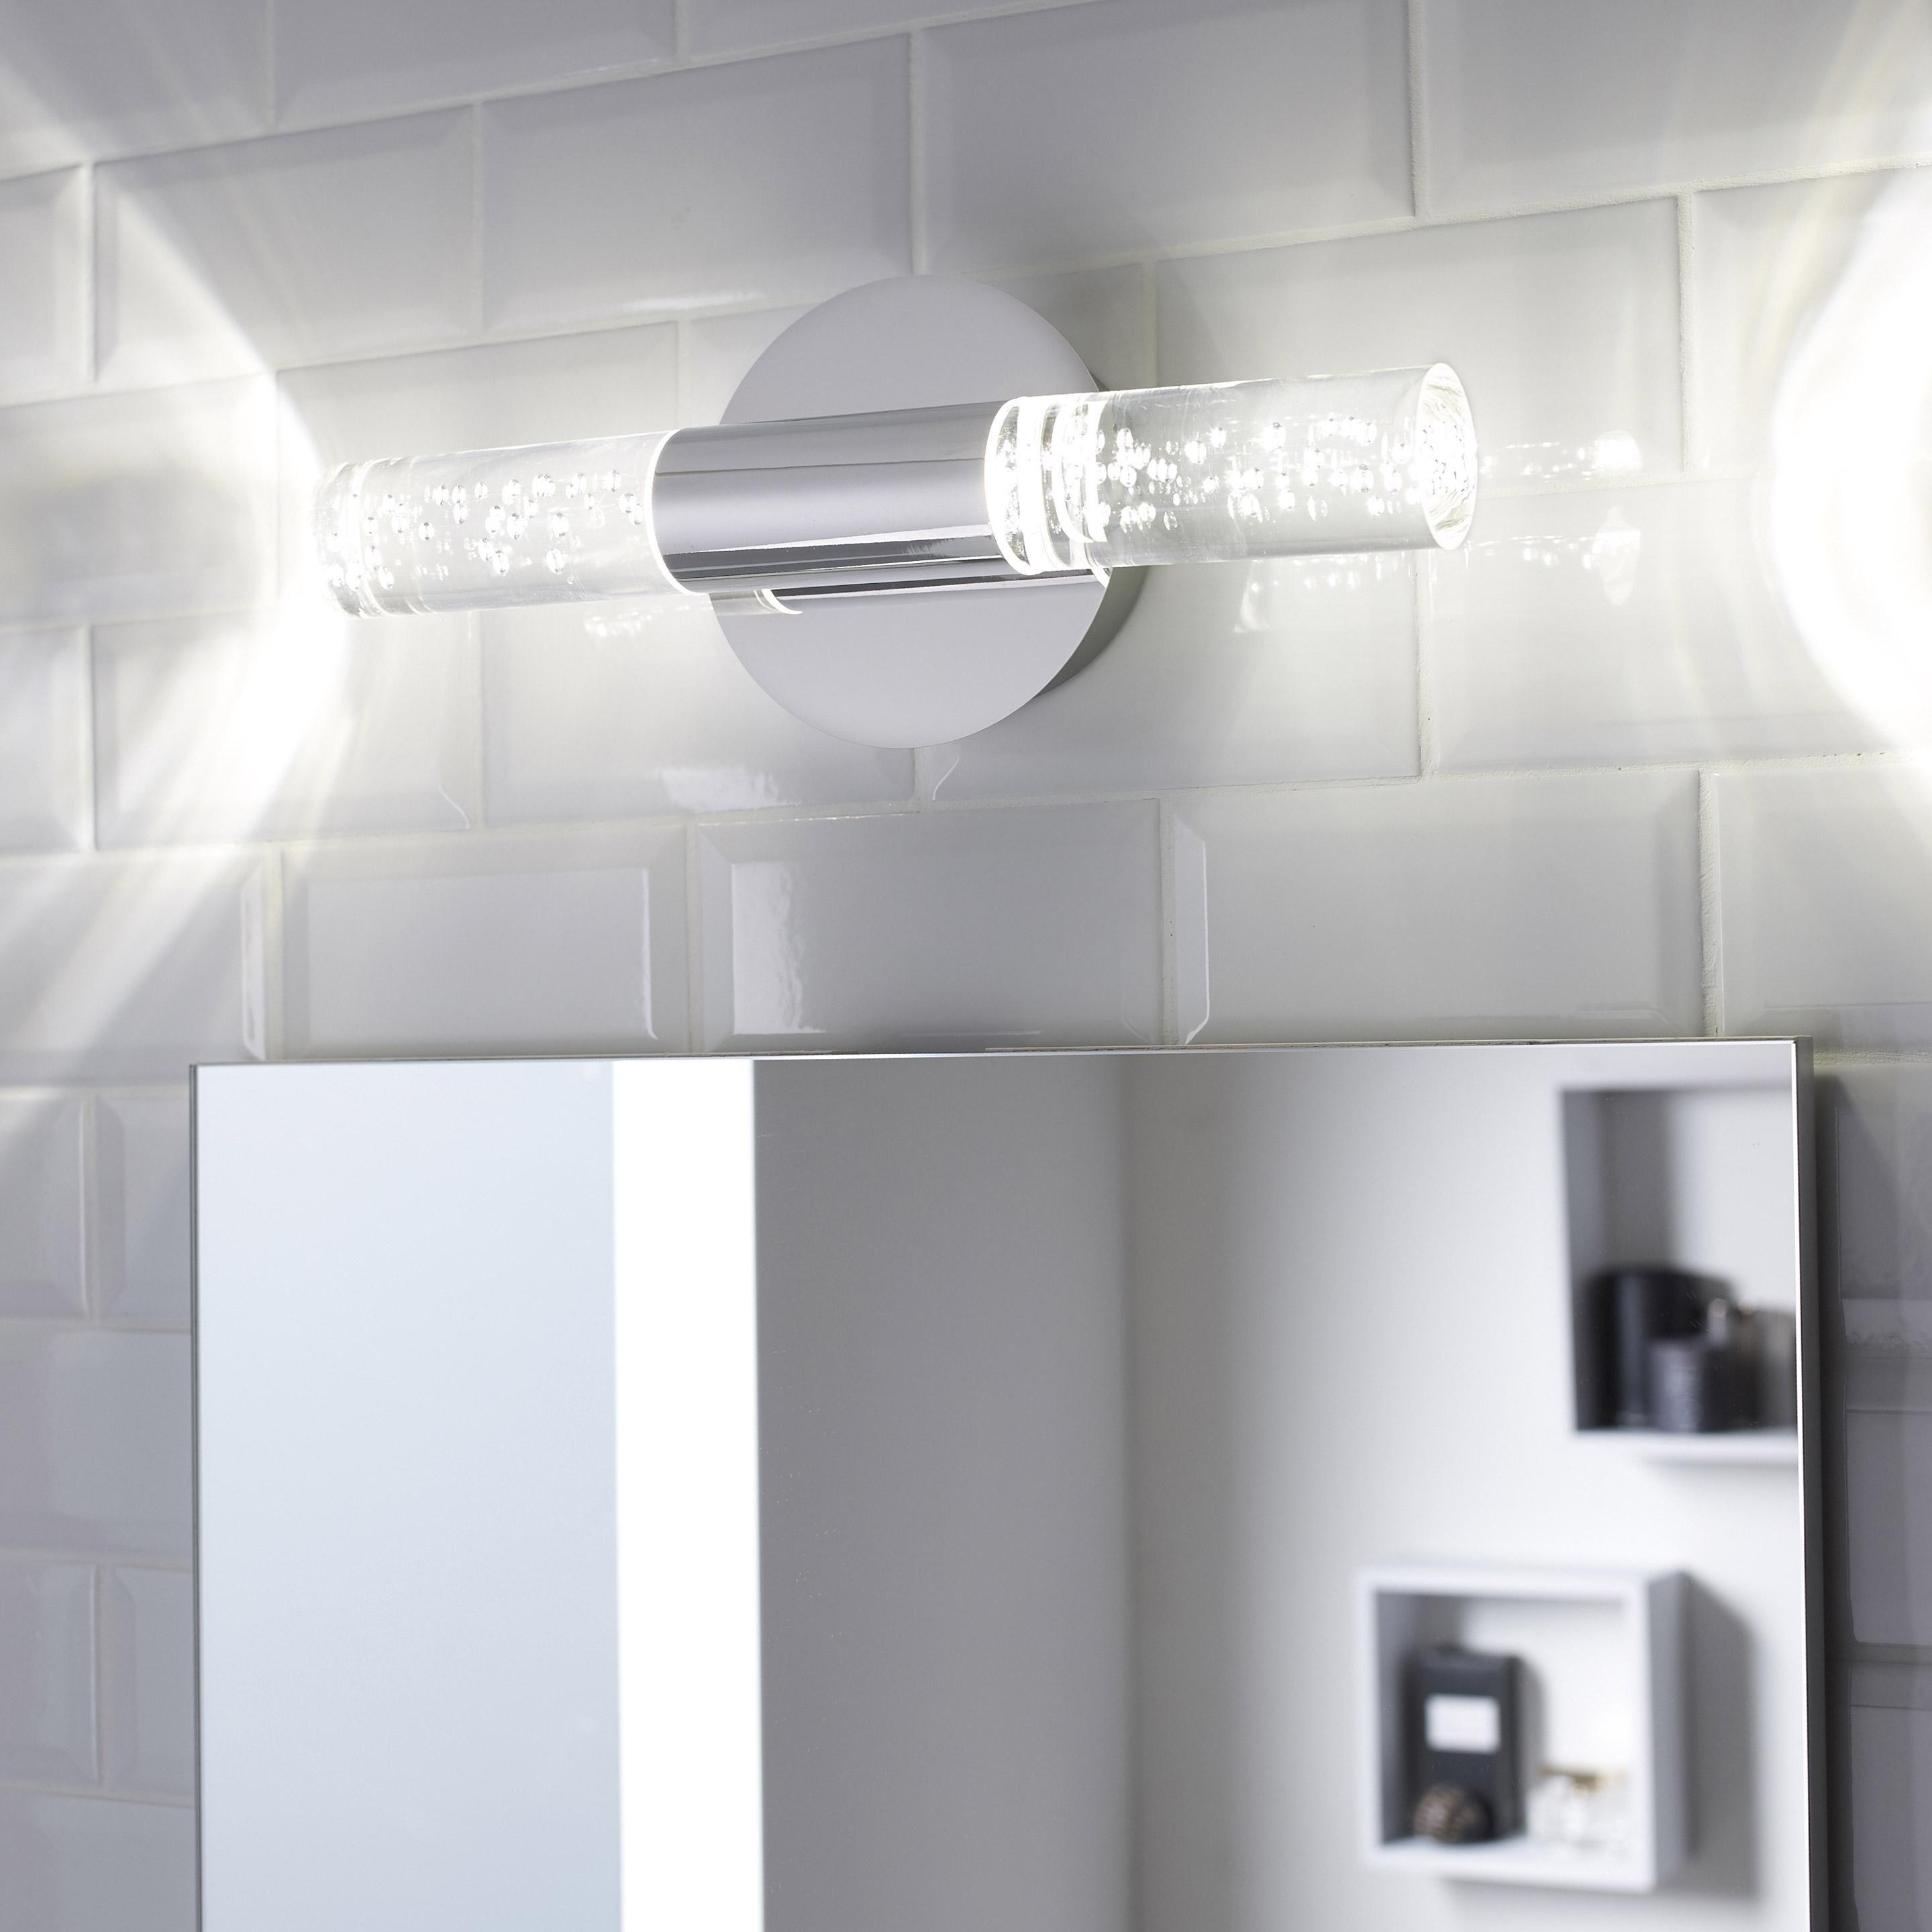 Applique Bula Led 2 X 5 W Led Integree Blanc Froid Leroy Merlin Eclairage Salle De Bain Led Eclairage